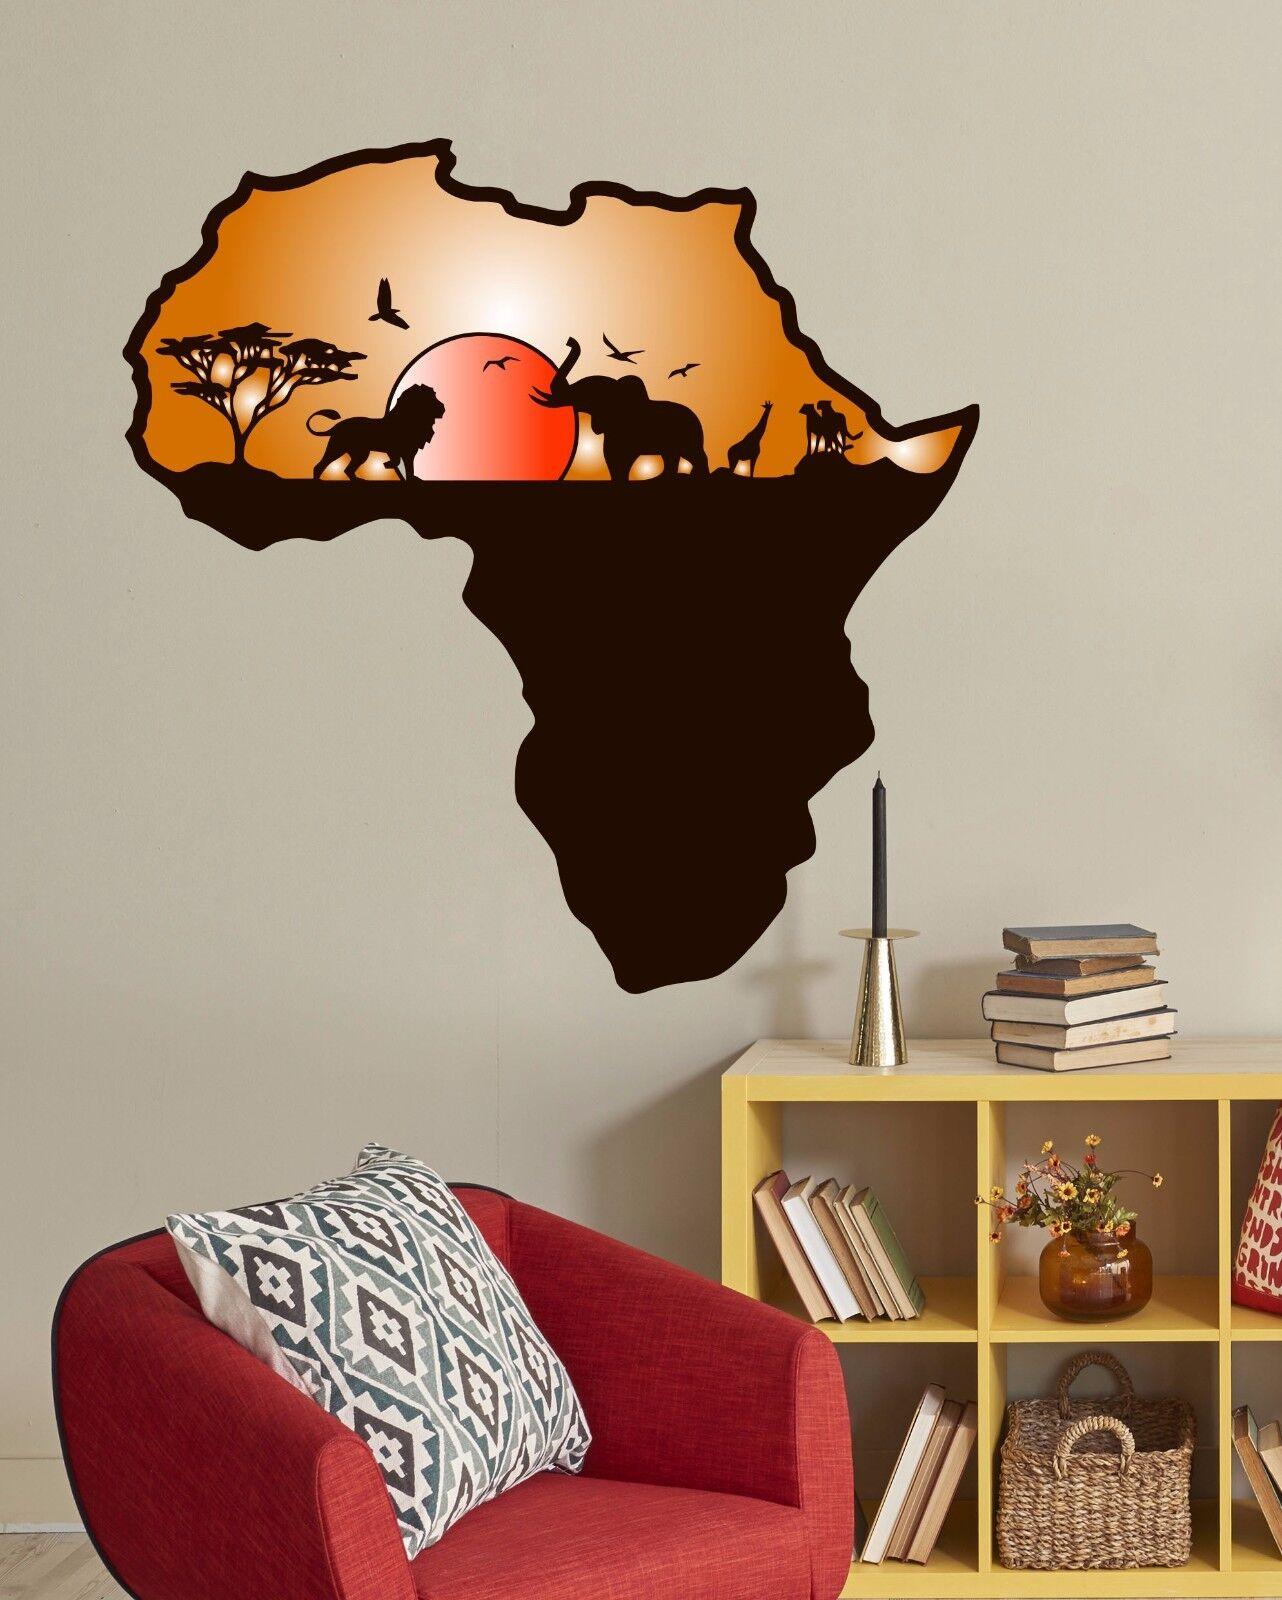 Wall Decals African Safari Full Farbe Murals Animals Jungle Map Nursery Art EN28